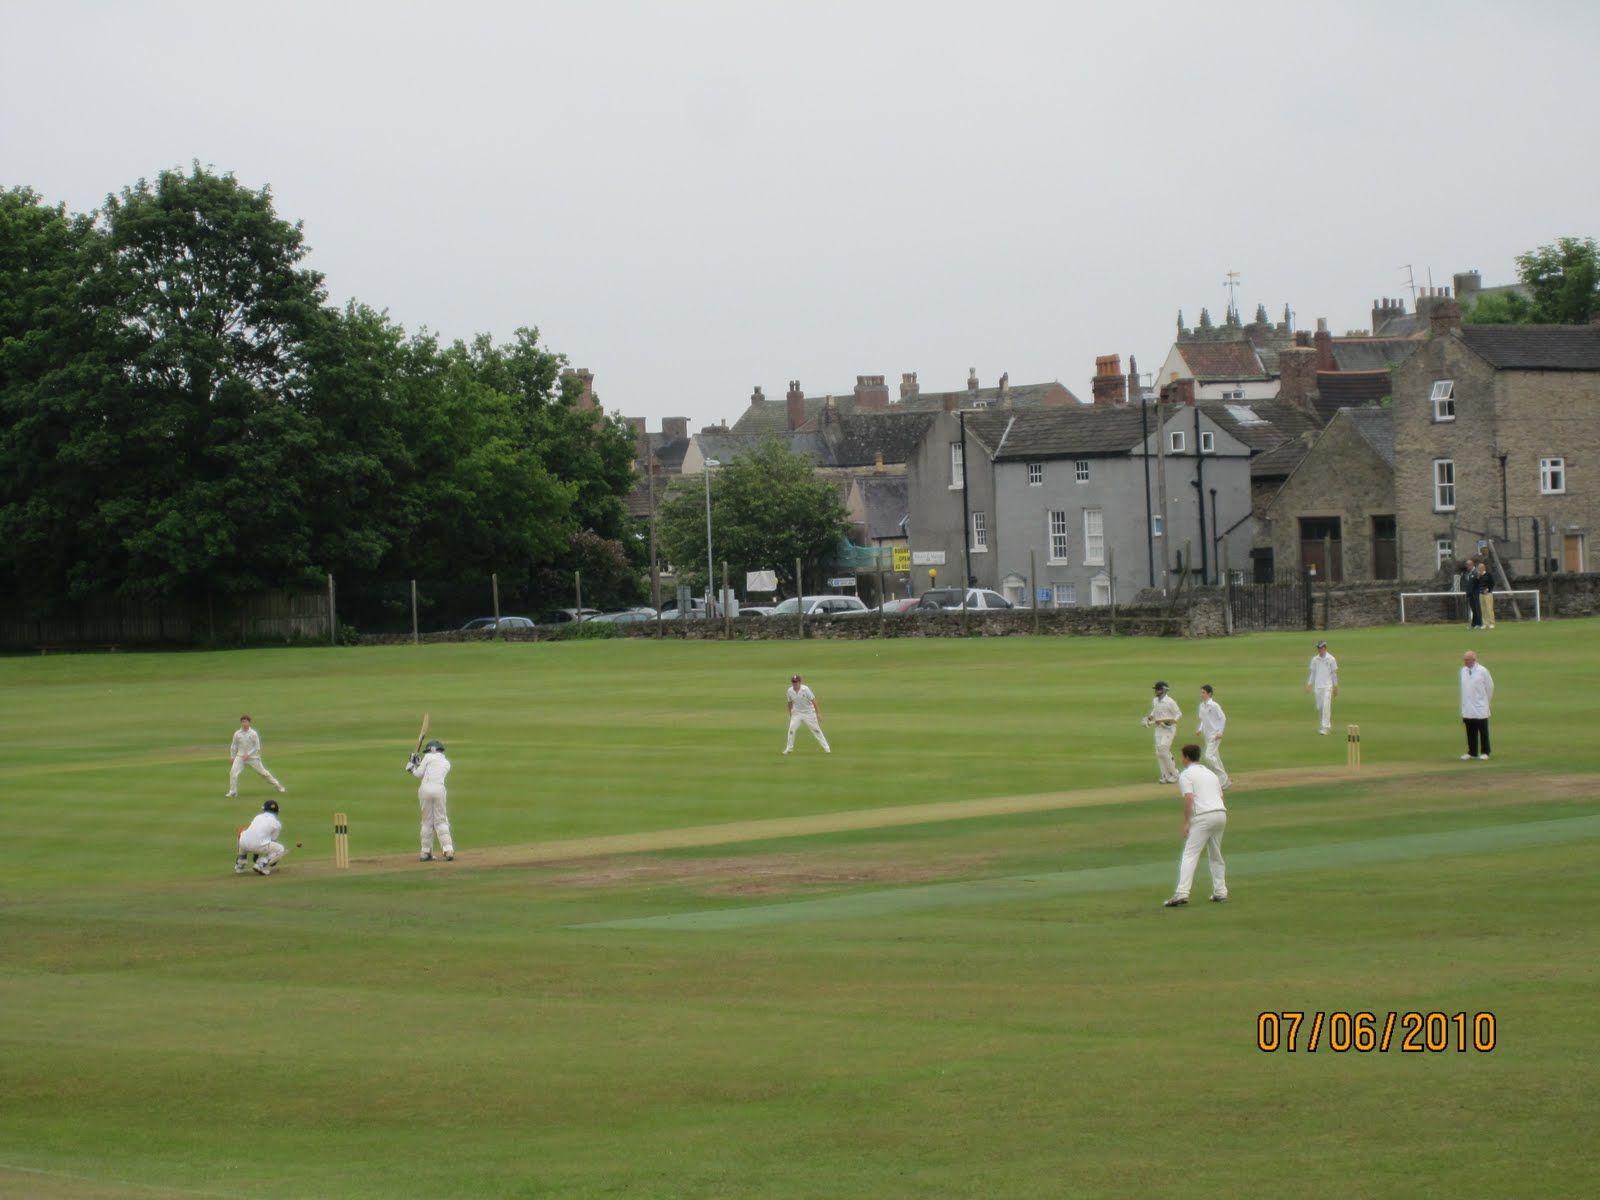 Richmond Cricket Club Cricket Club Soccer Field Baseball Field